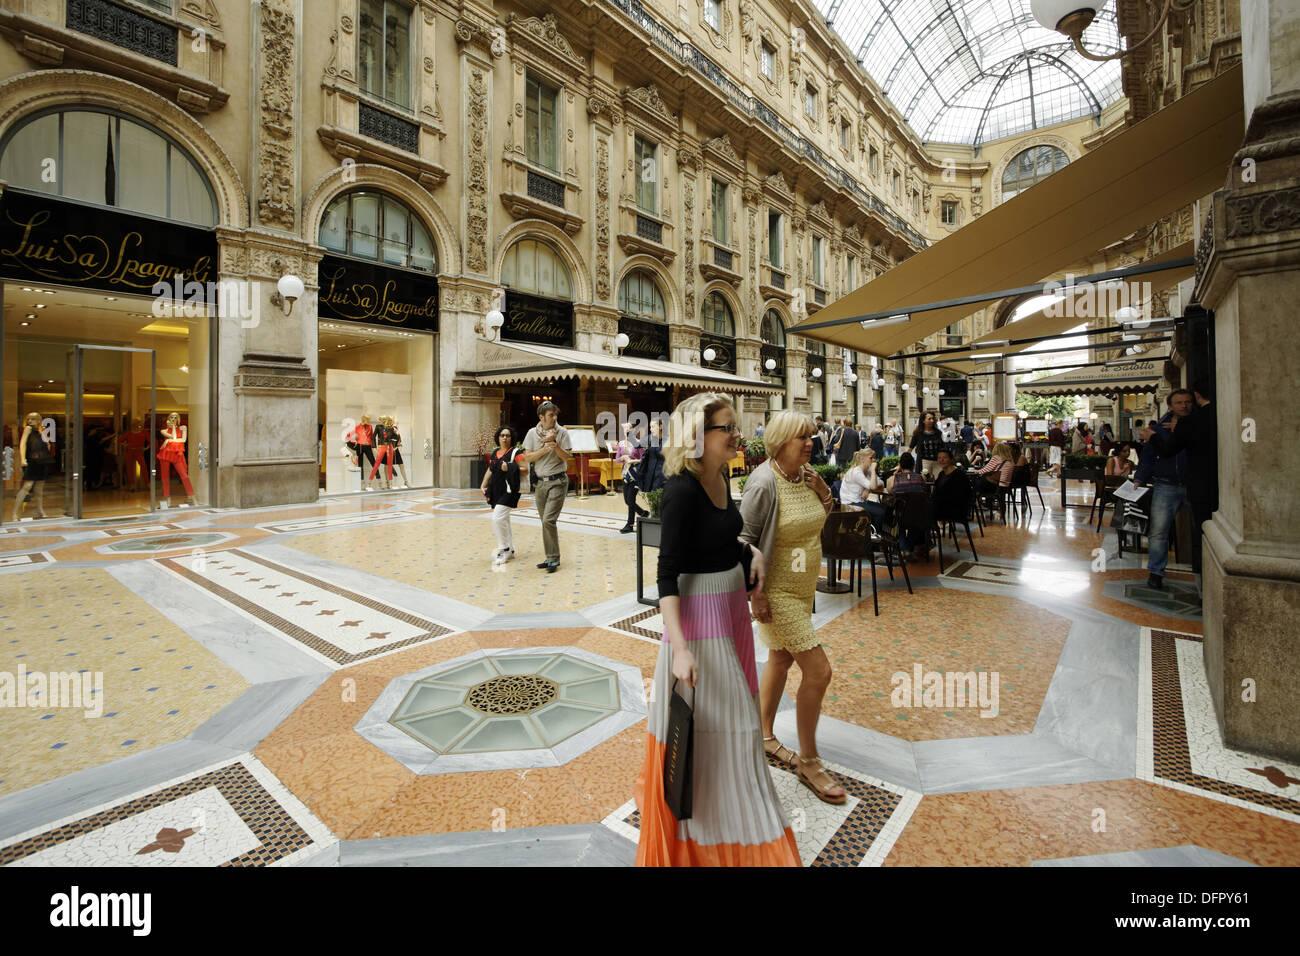 Italy Lombardy Milan Gallery Vittorio Emanuele Ii Shopping Stock Photo Alamy